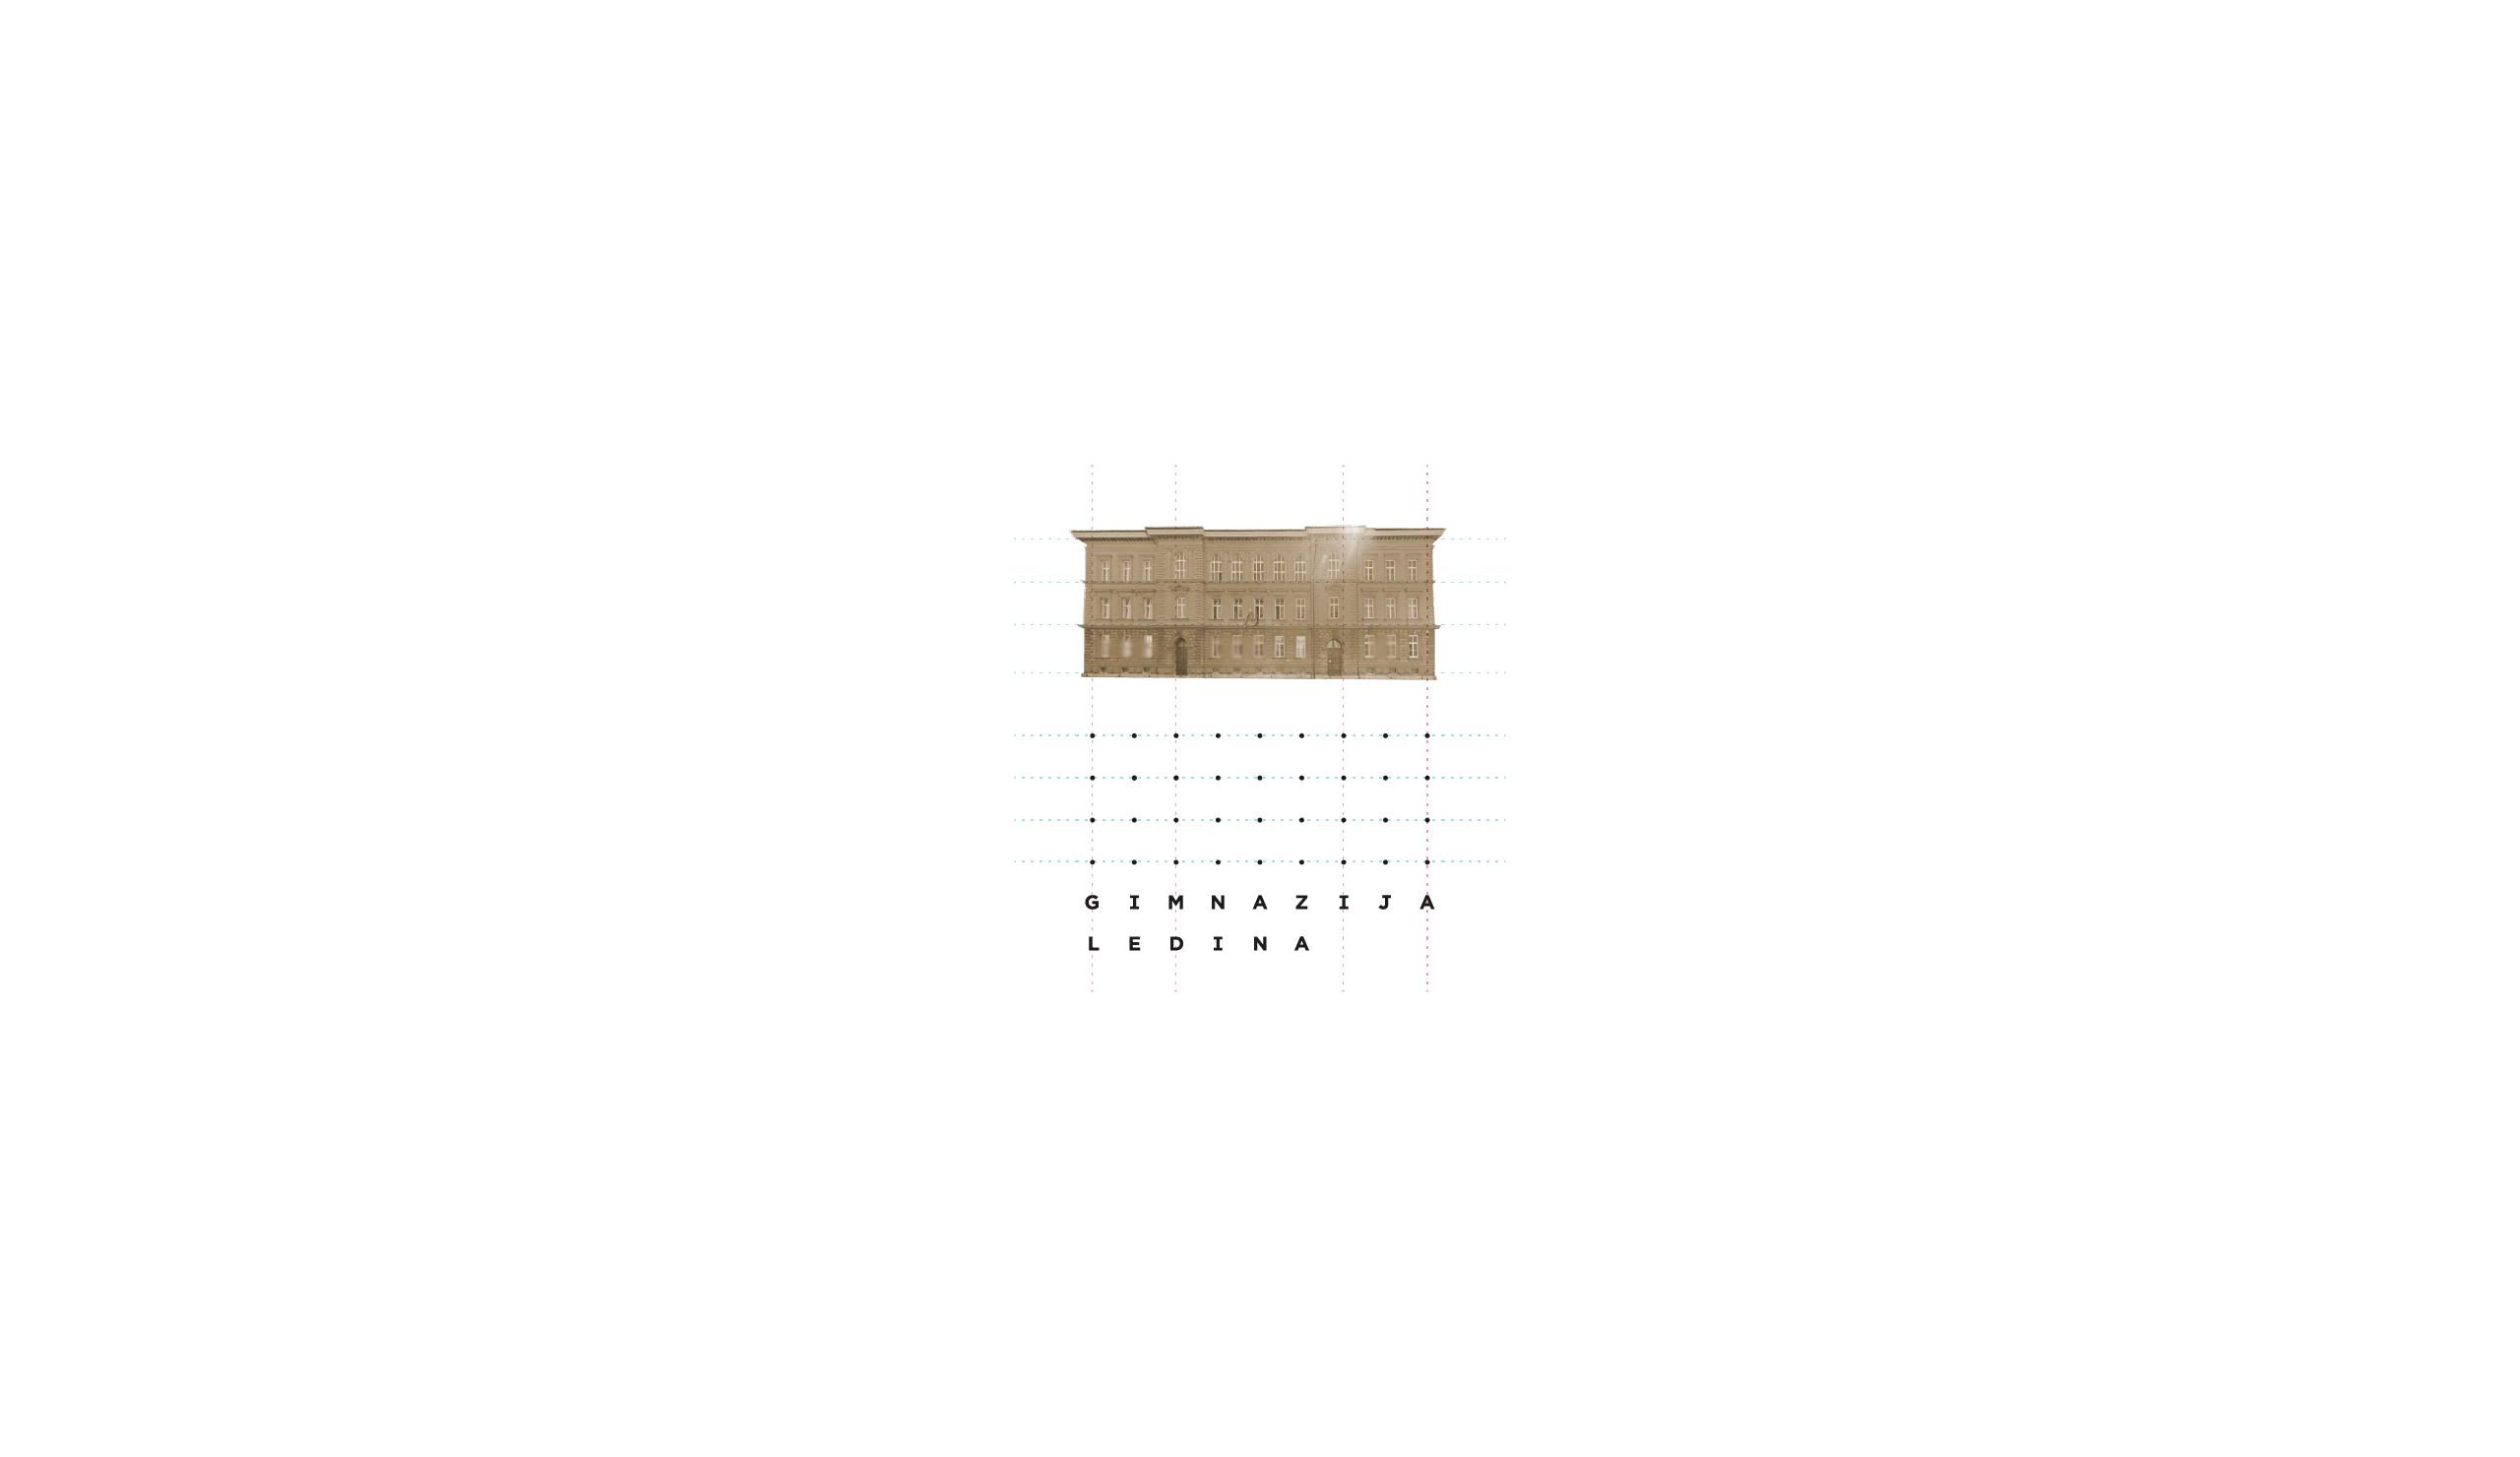 ledina-logo–01